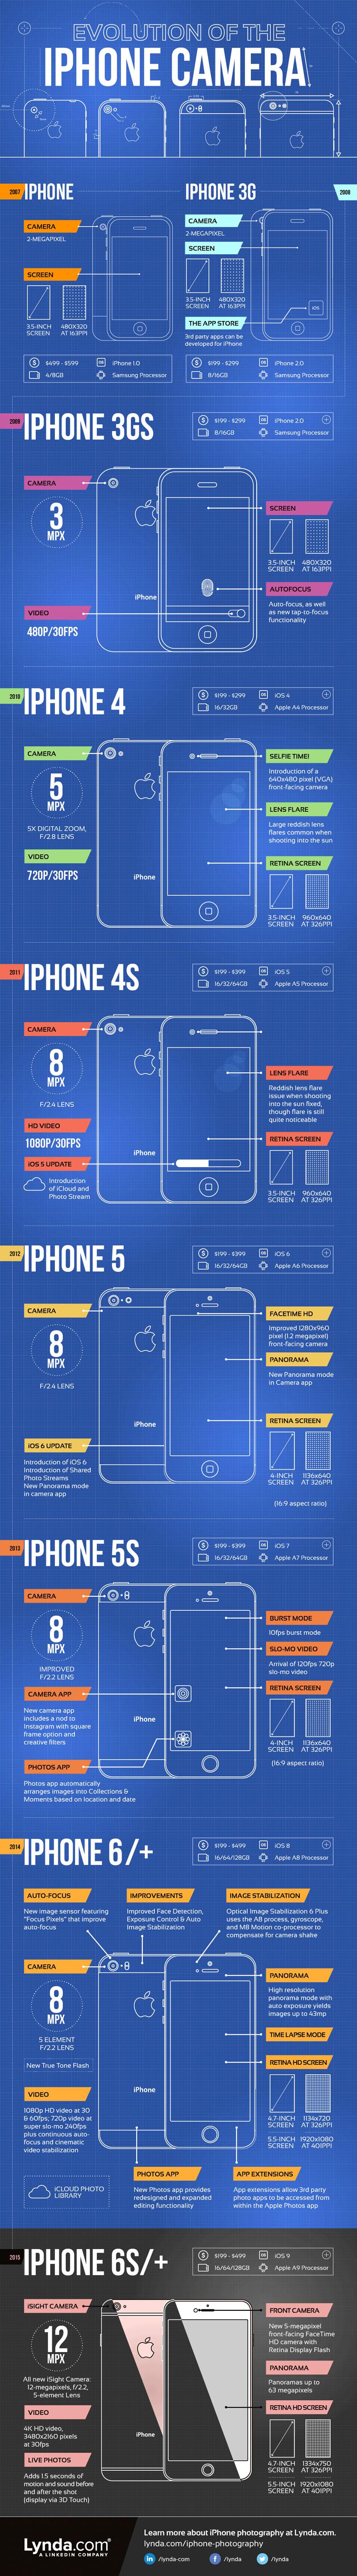 evolution-appareil-photo-iphone